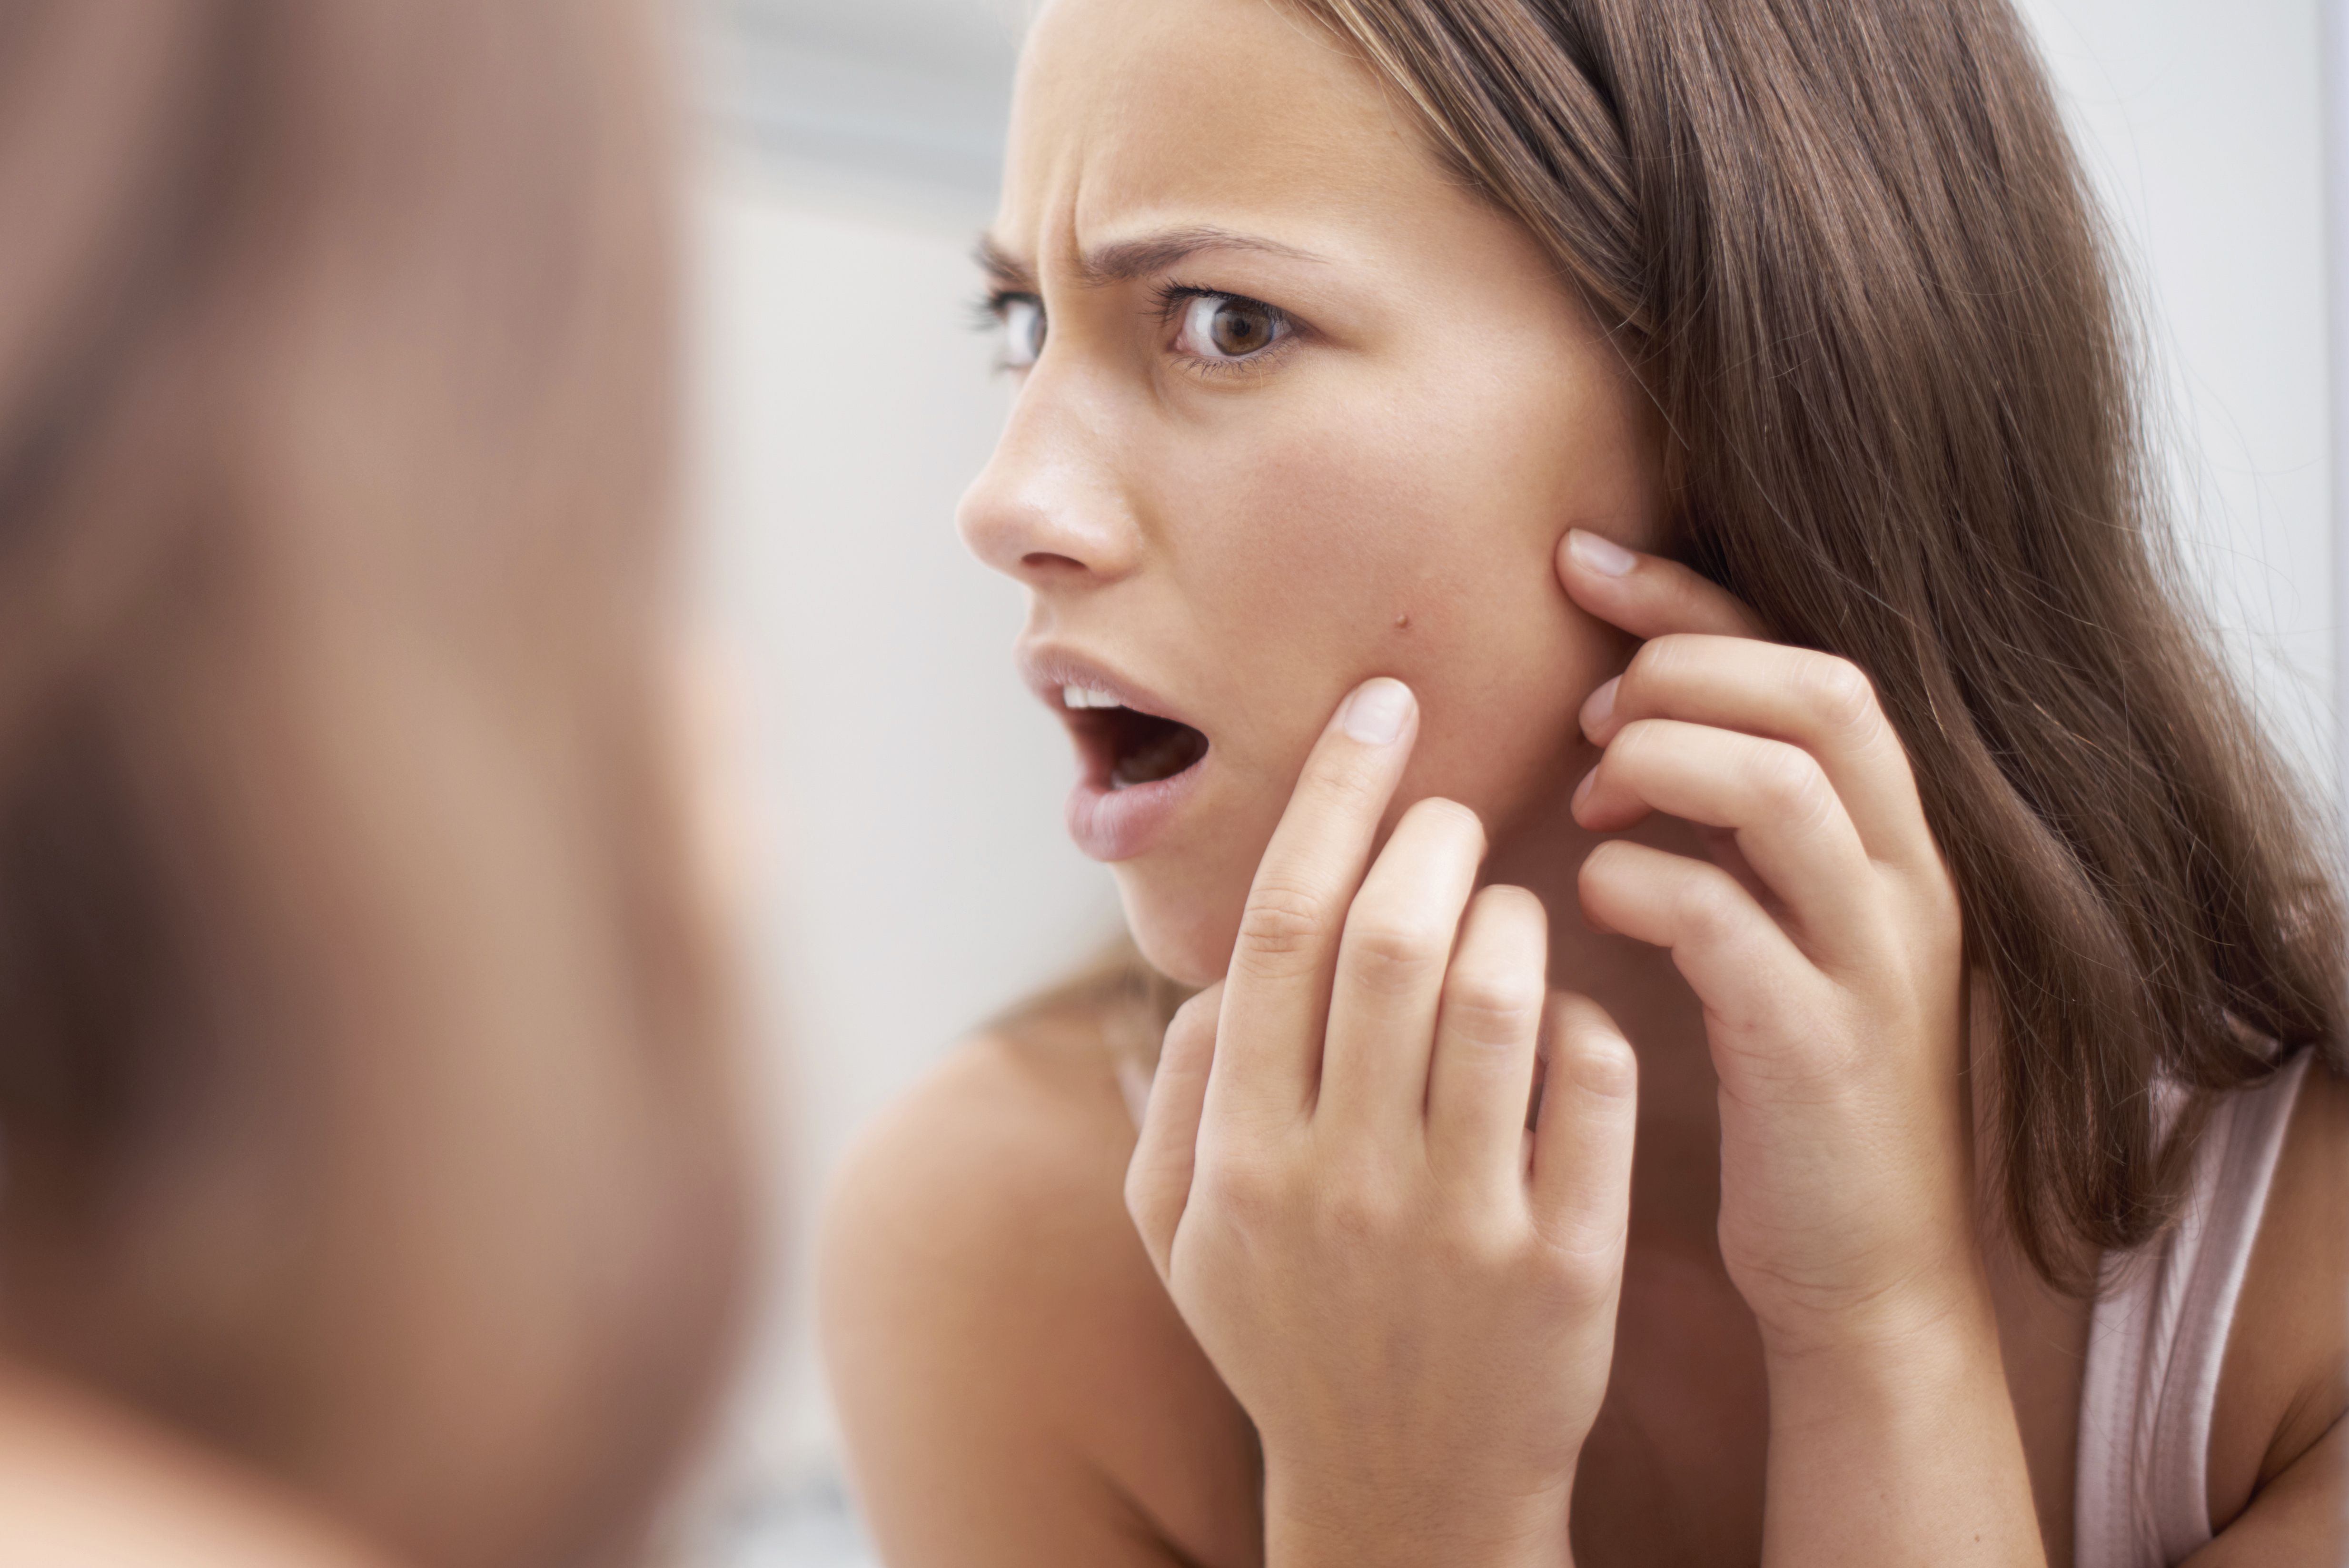 17 Struggles Girls With Super Strict Parents Understand - Dealing